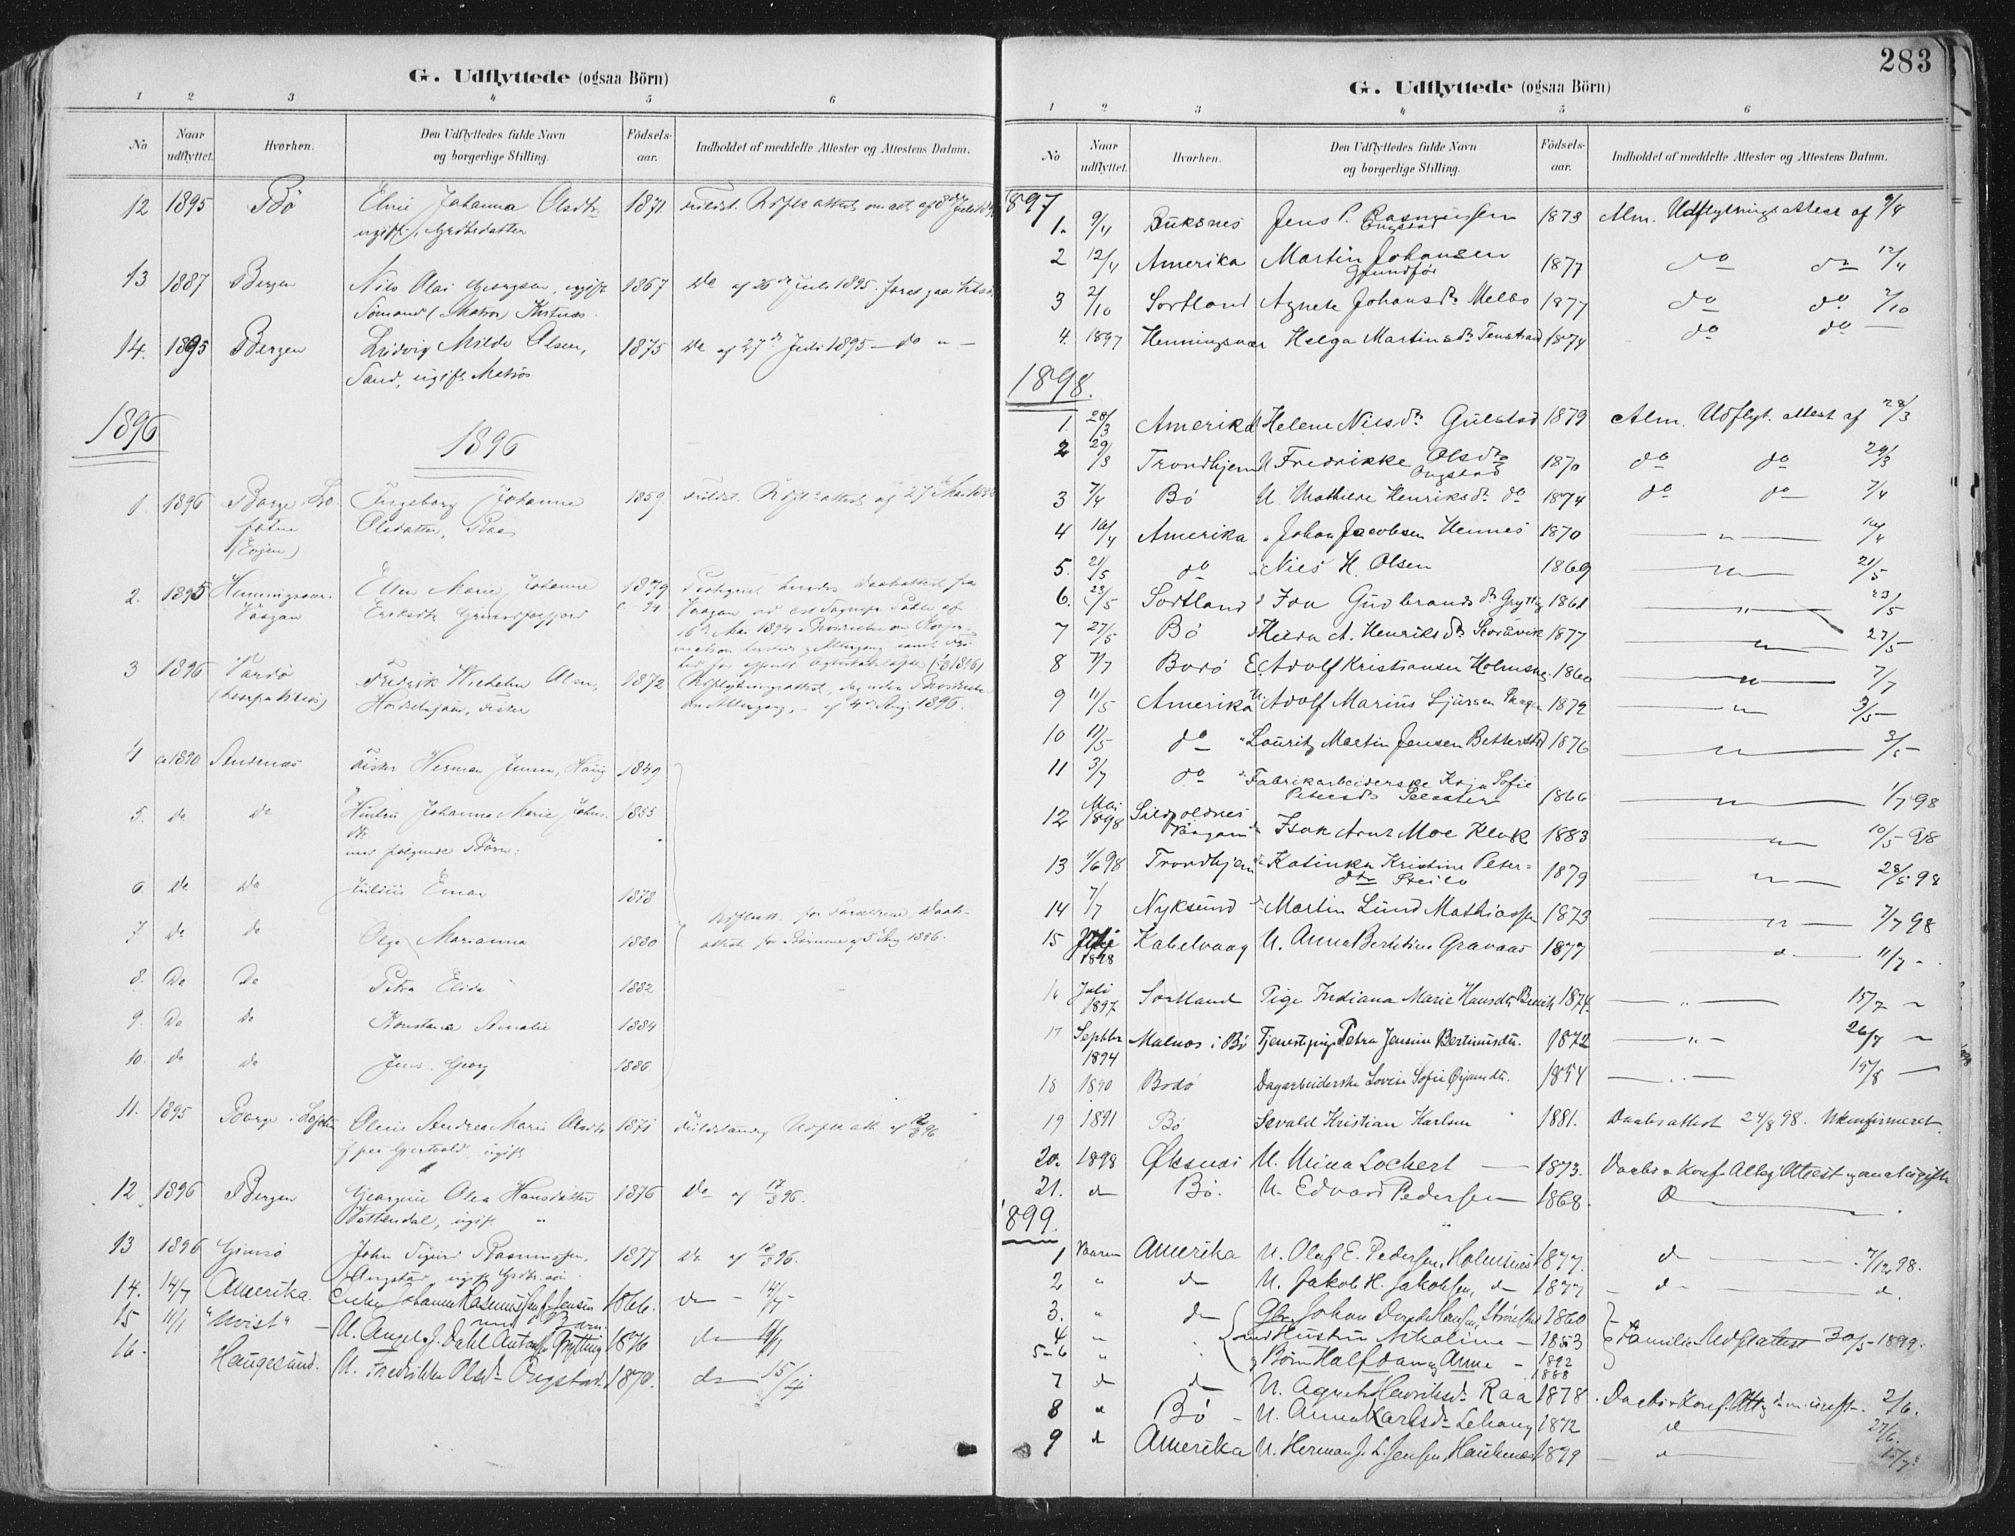 SAT, Ministerialprotokoller, klokkerbøker og fødselsregistre - Nordland, 888/L1246: Ministerialbok nr. 888A12, 1891-1903, s. 283